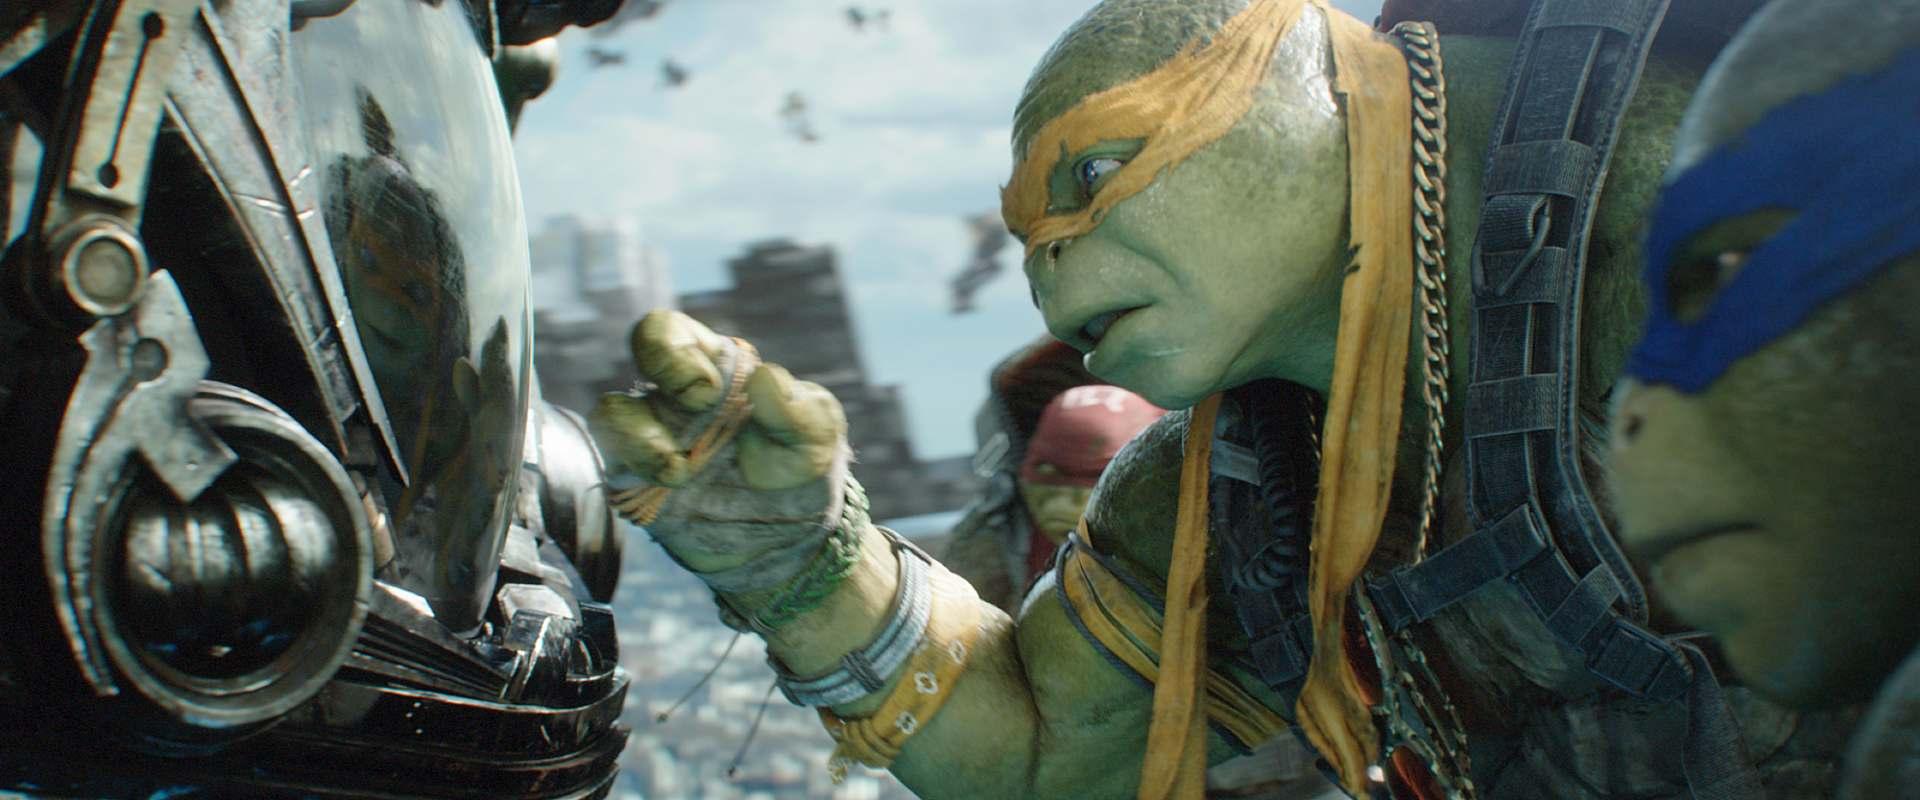 Watch Teenage Mutant Ninja Turtles Out Of The Shadows On Netflix